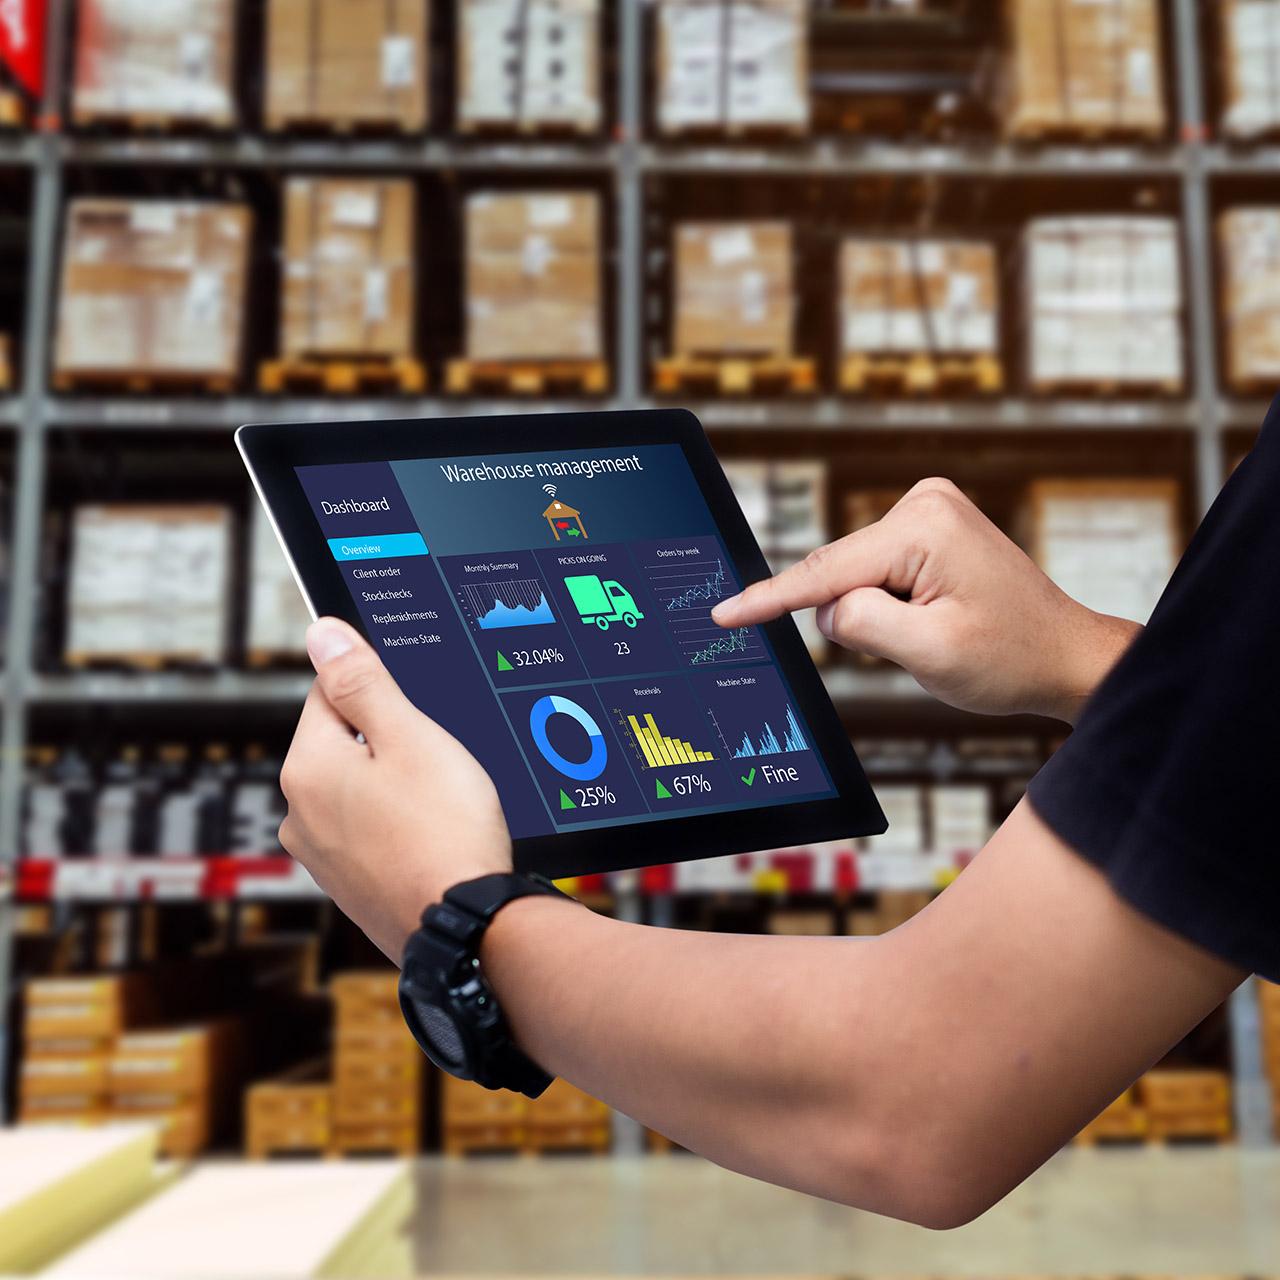 distribution management technology